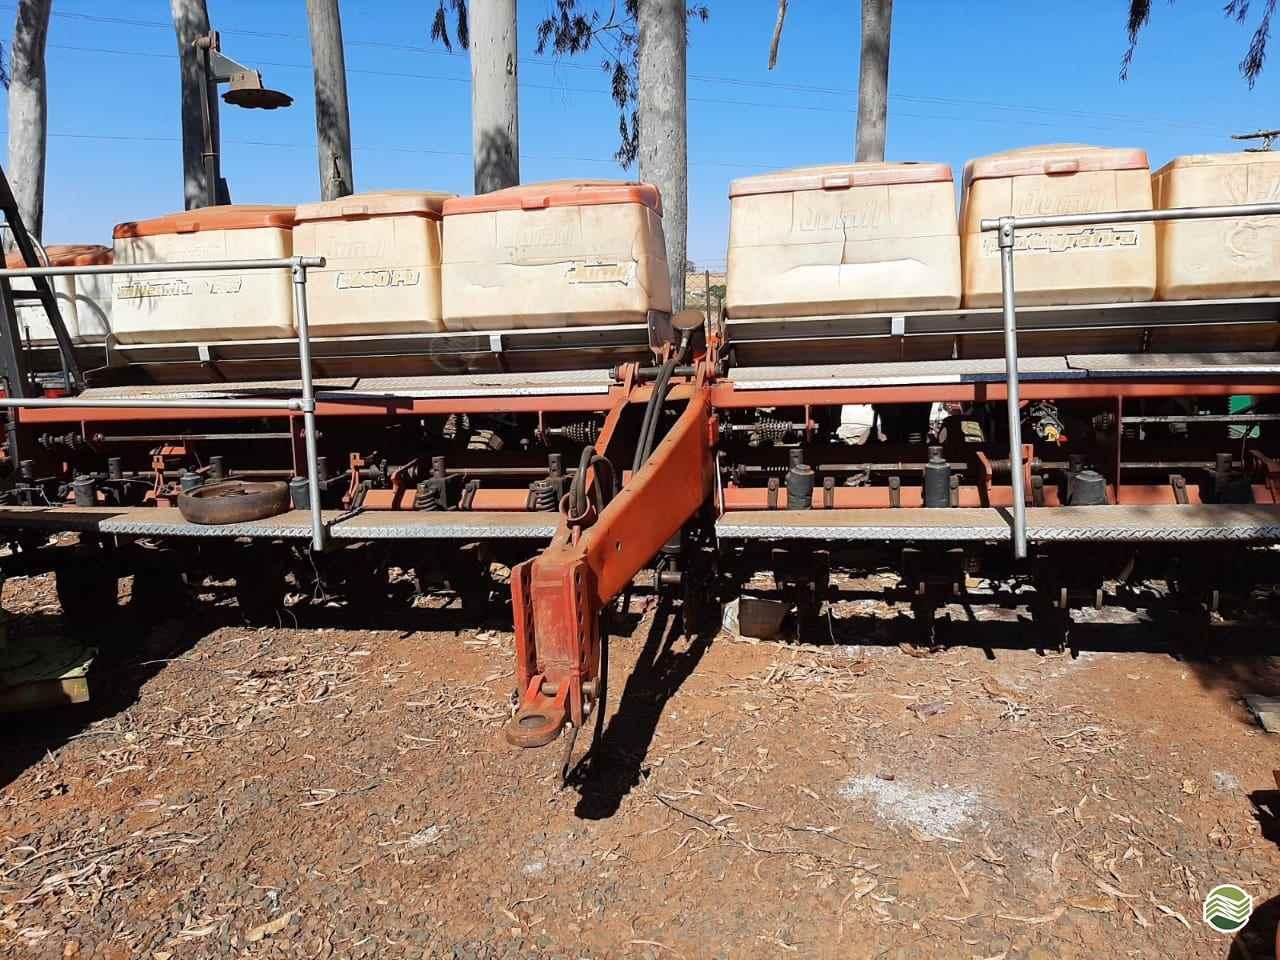 PLANTADEIRA JUMIL JM 2880 Gerominho Implementos Agrícolas UBERLANDIA MINAS GERAIS MG